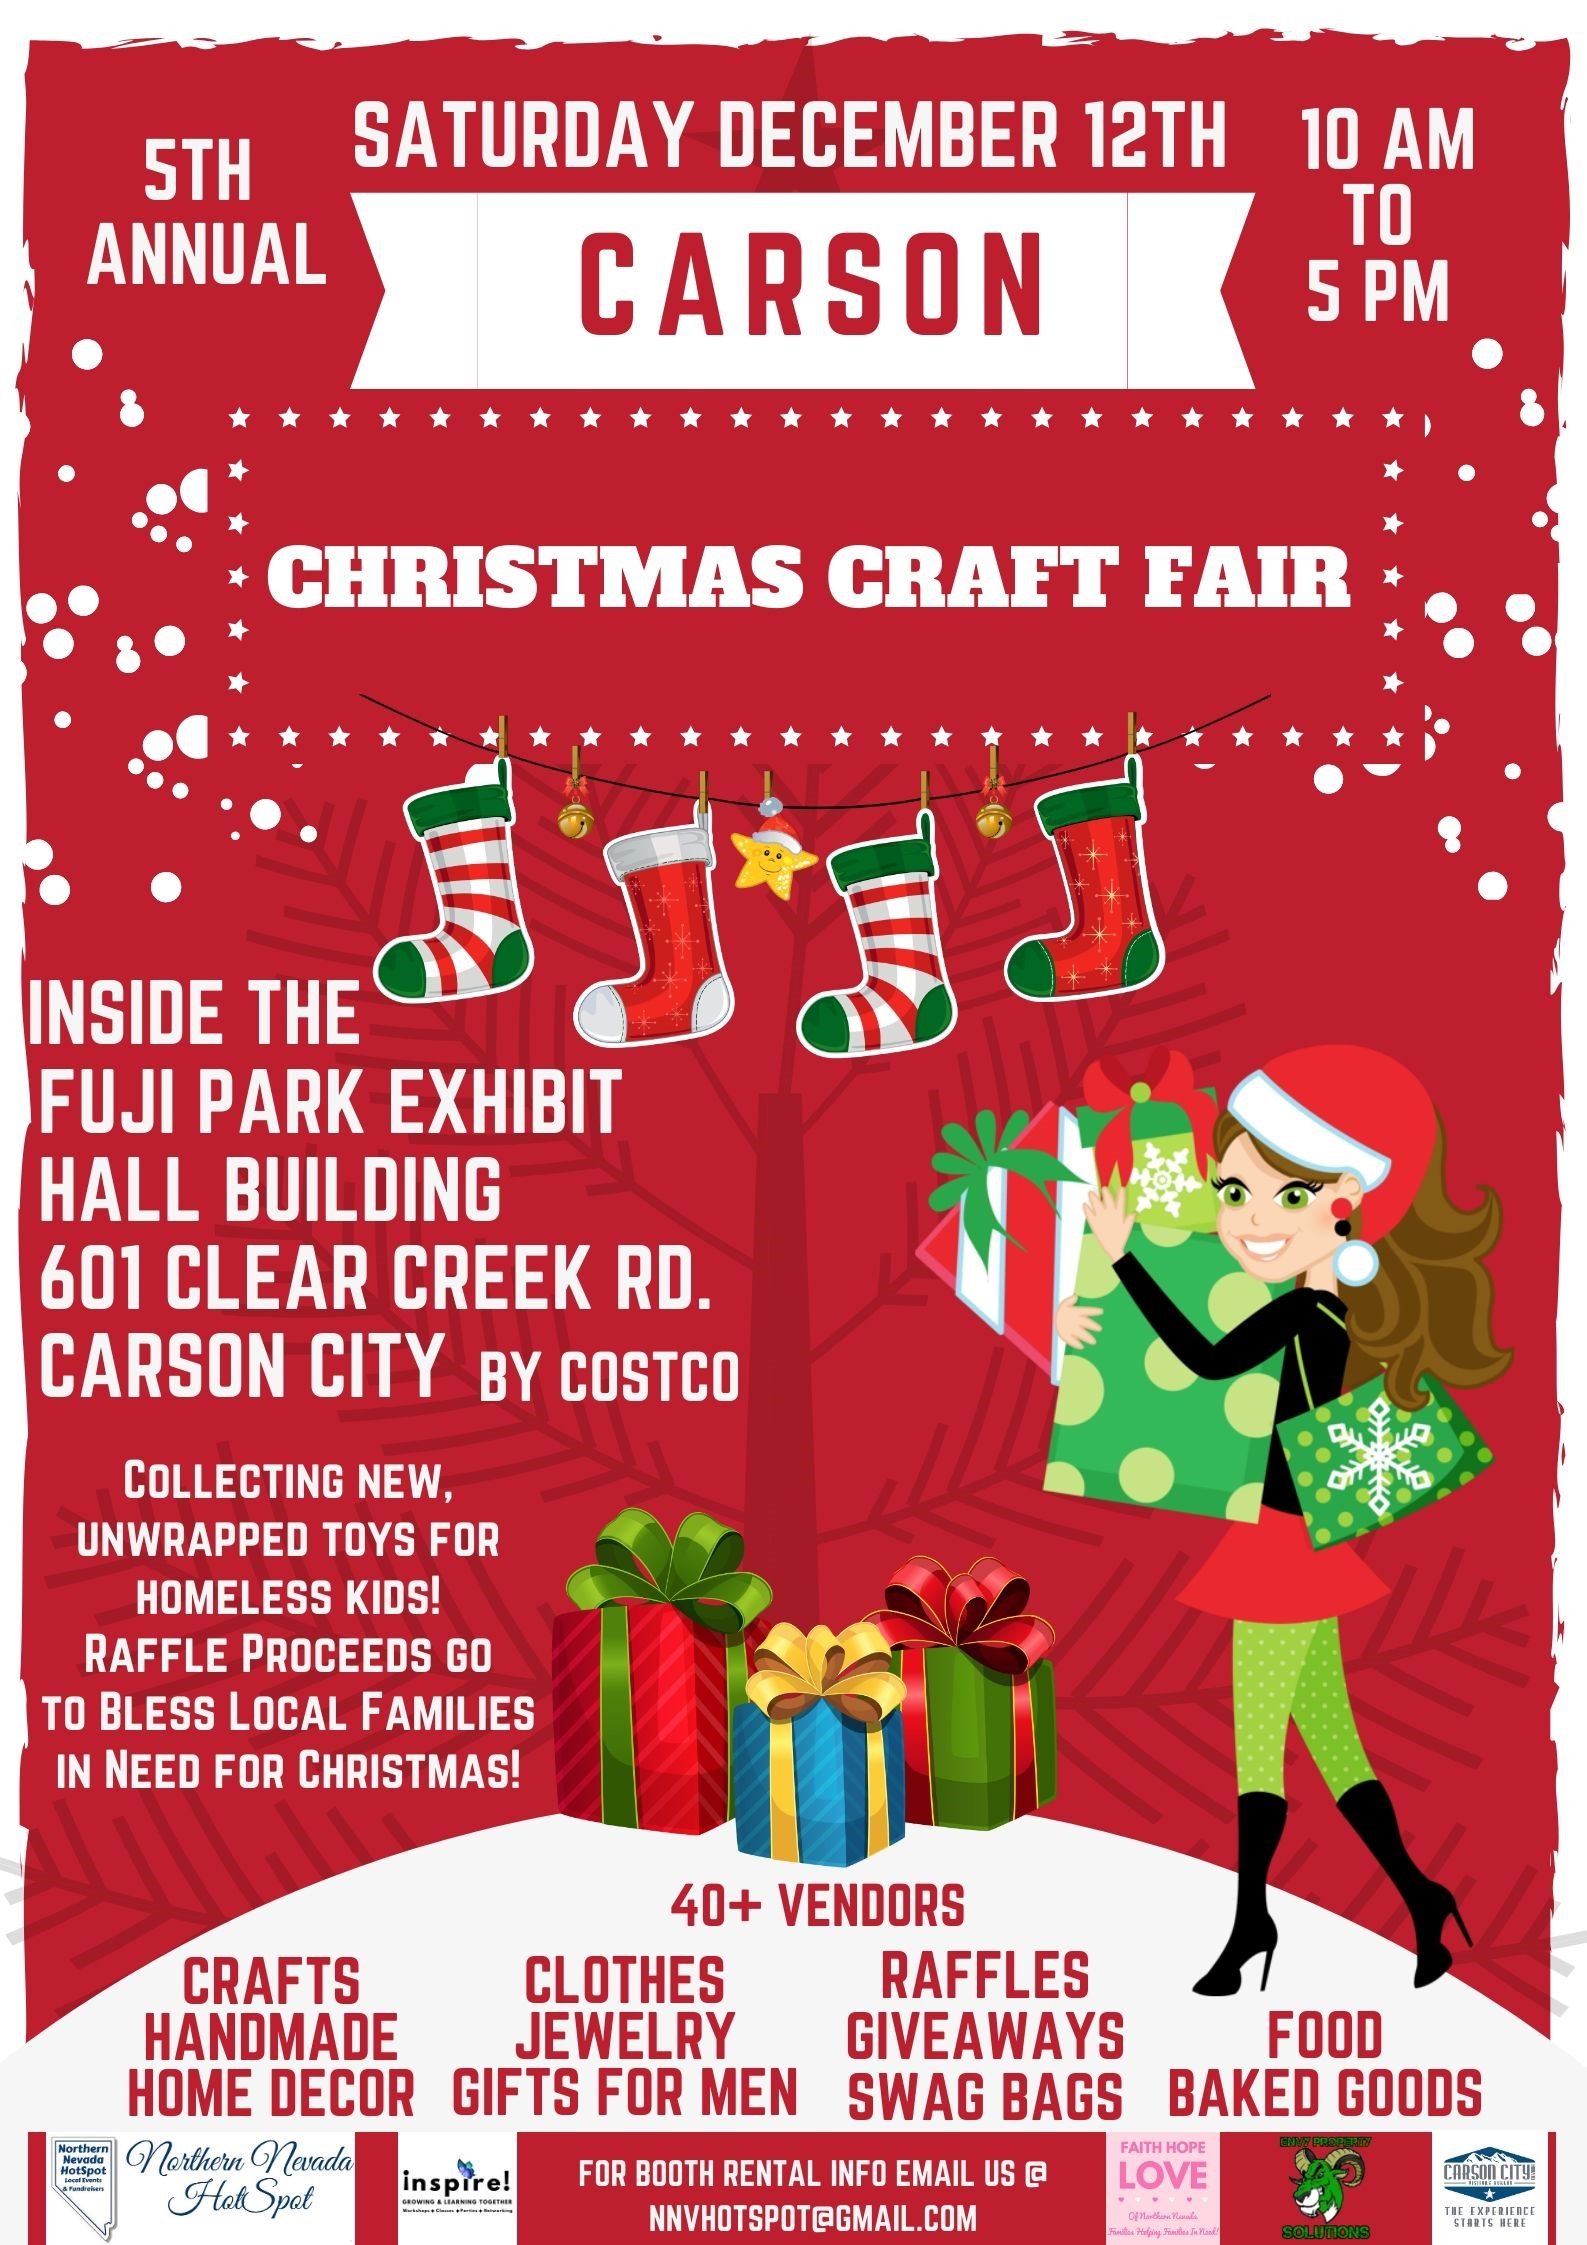 Christmas Craft Fair Visit Carson City